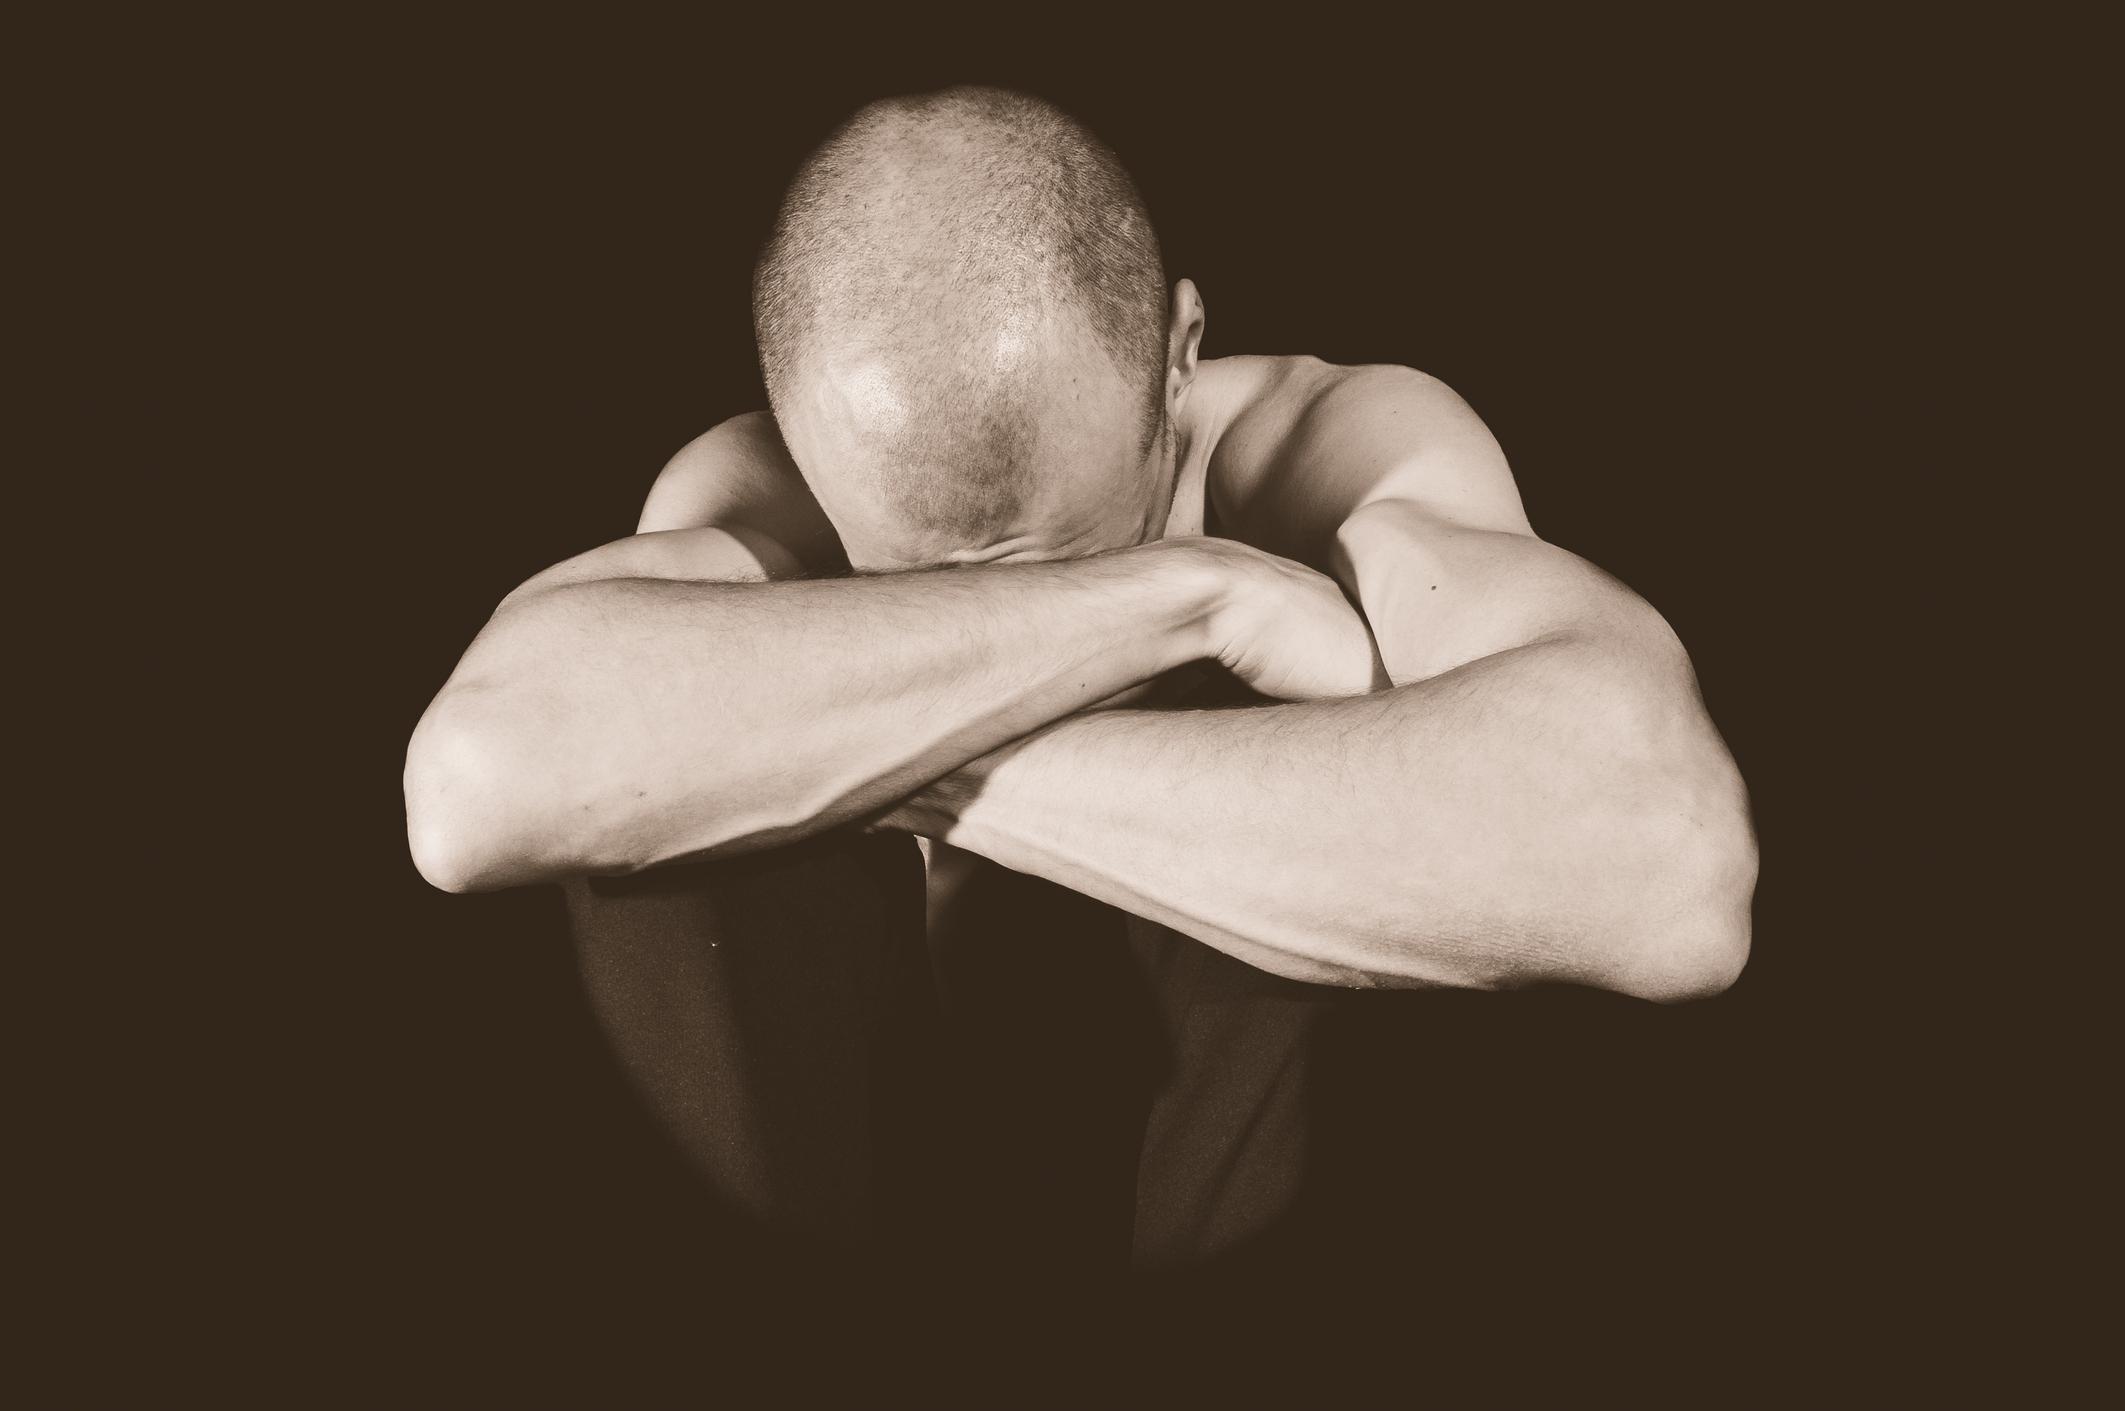 Men's Mental Health is A Silent Crisis